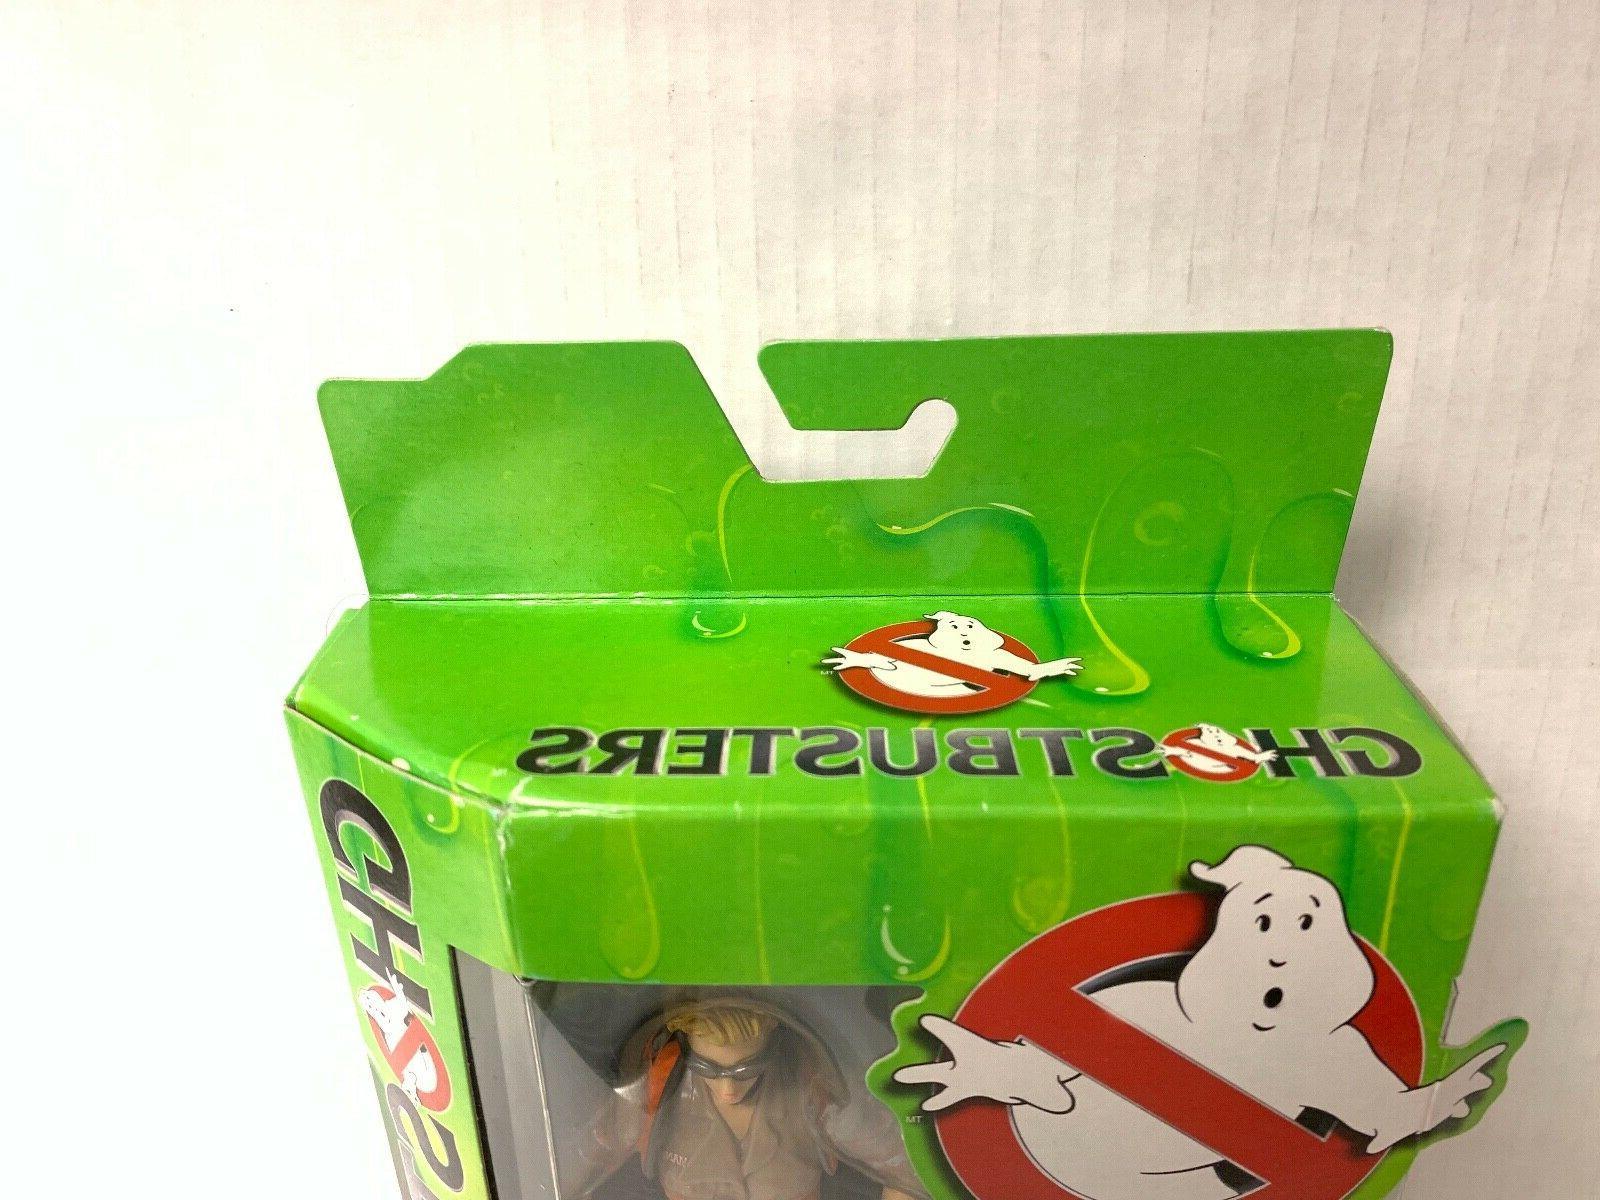 "Ghostbusters Jillian 6"" Action NEW"